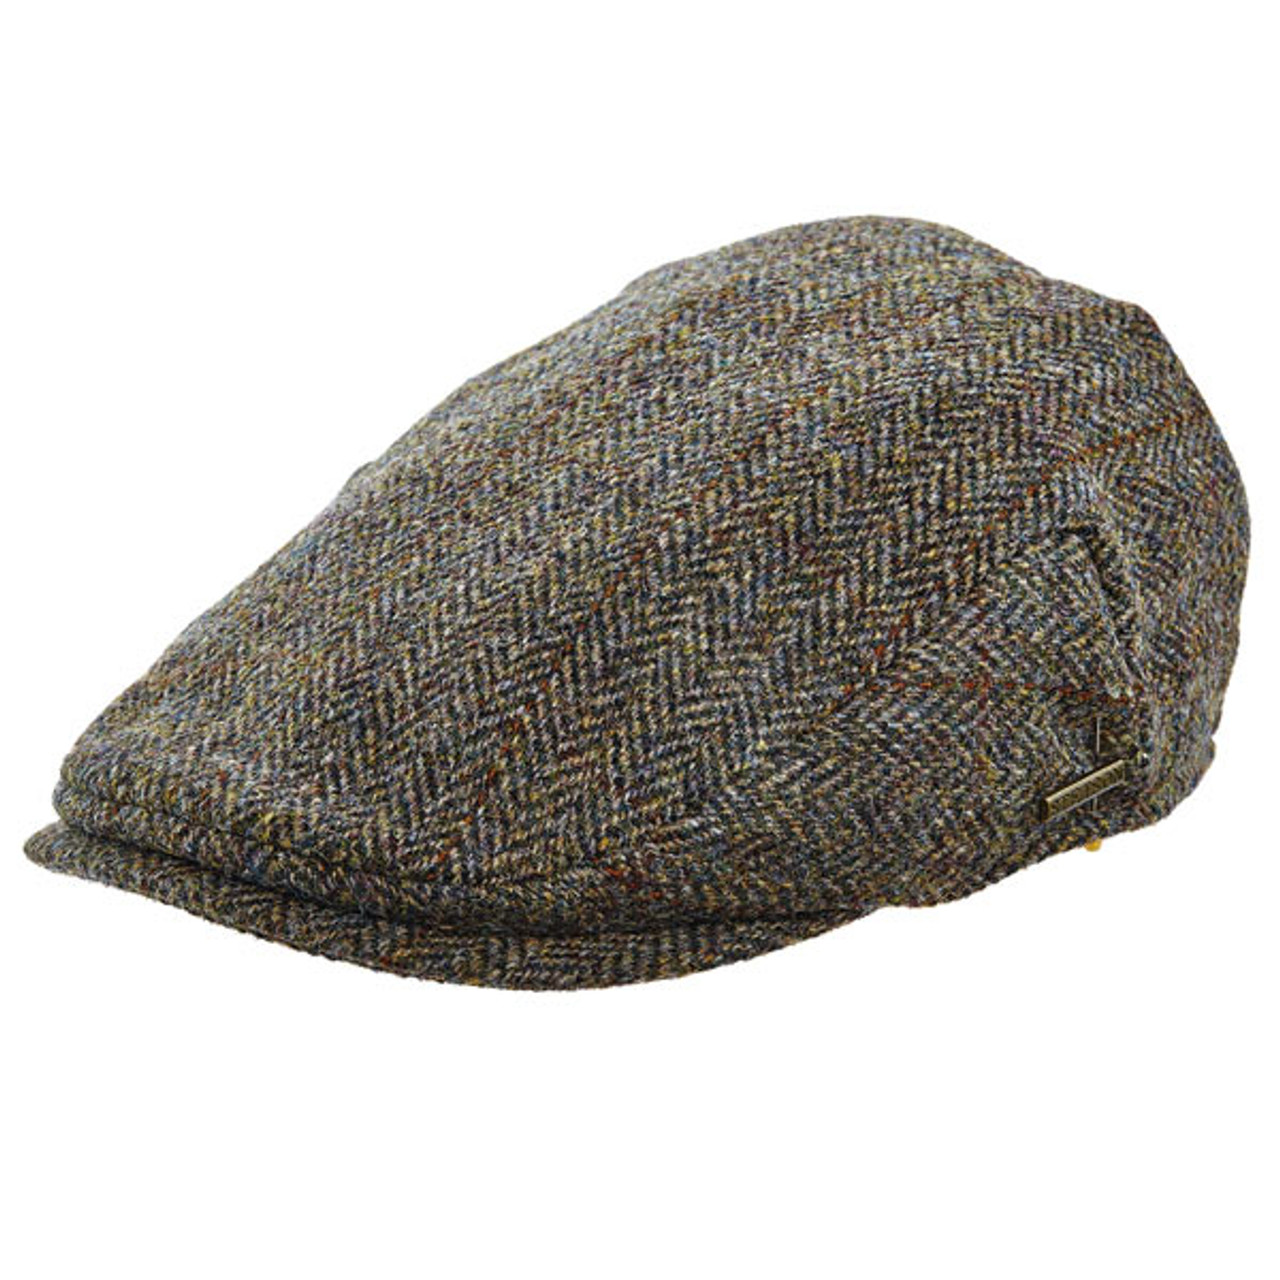 e0f06b3ff03aa Stetson | Harris Tweed Ivy Cap | Hats Unlimited